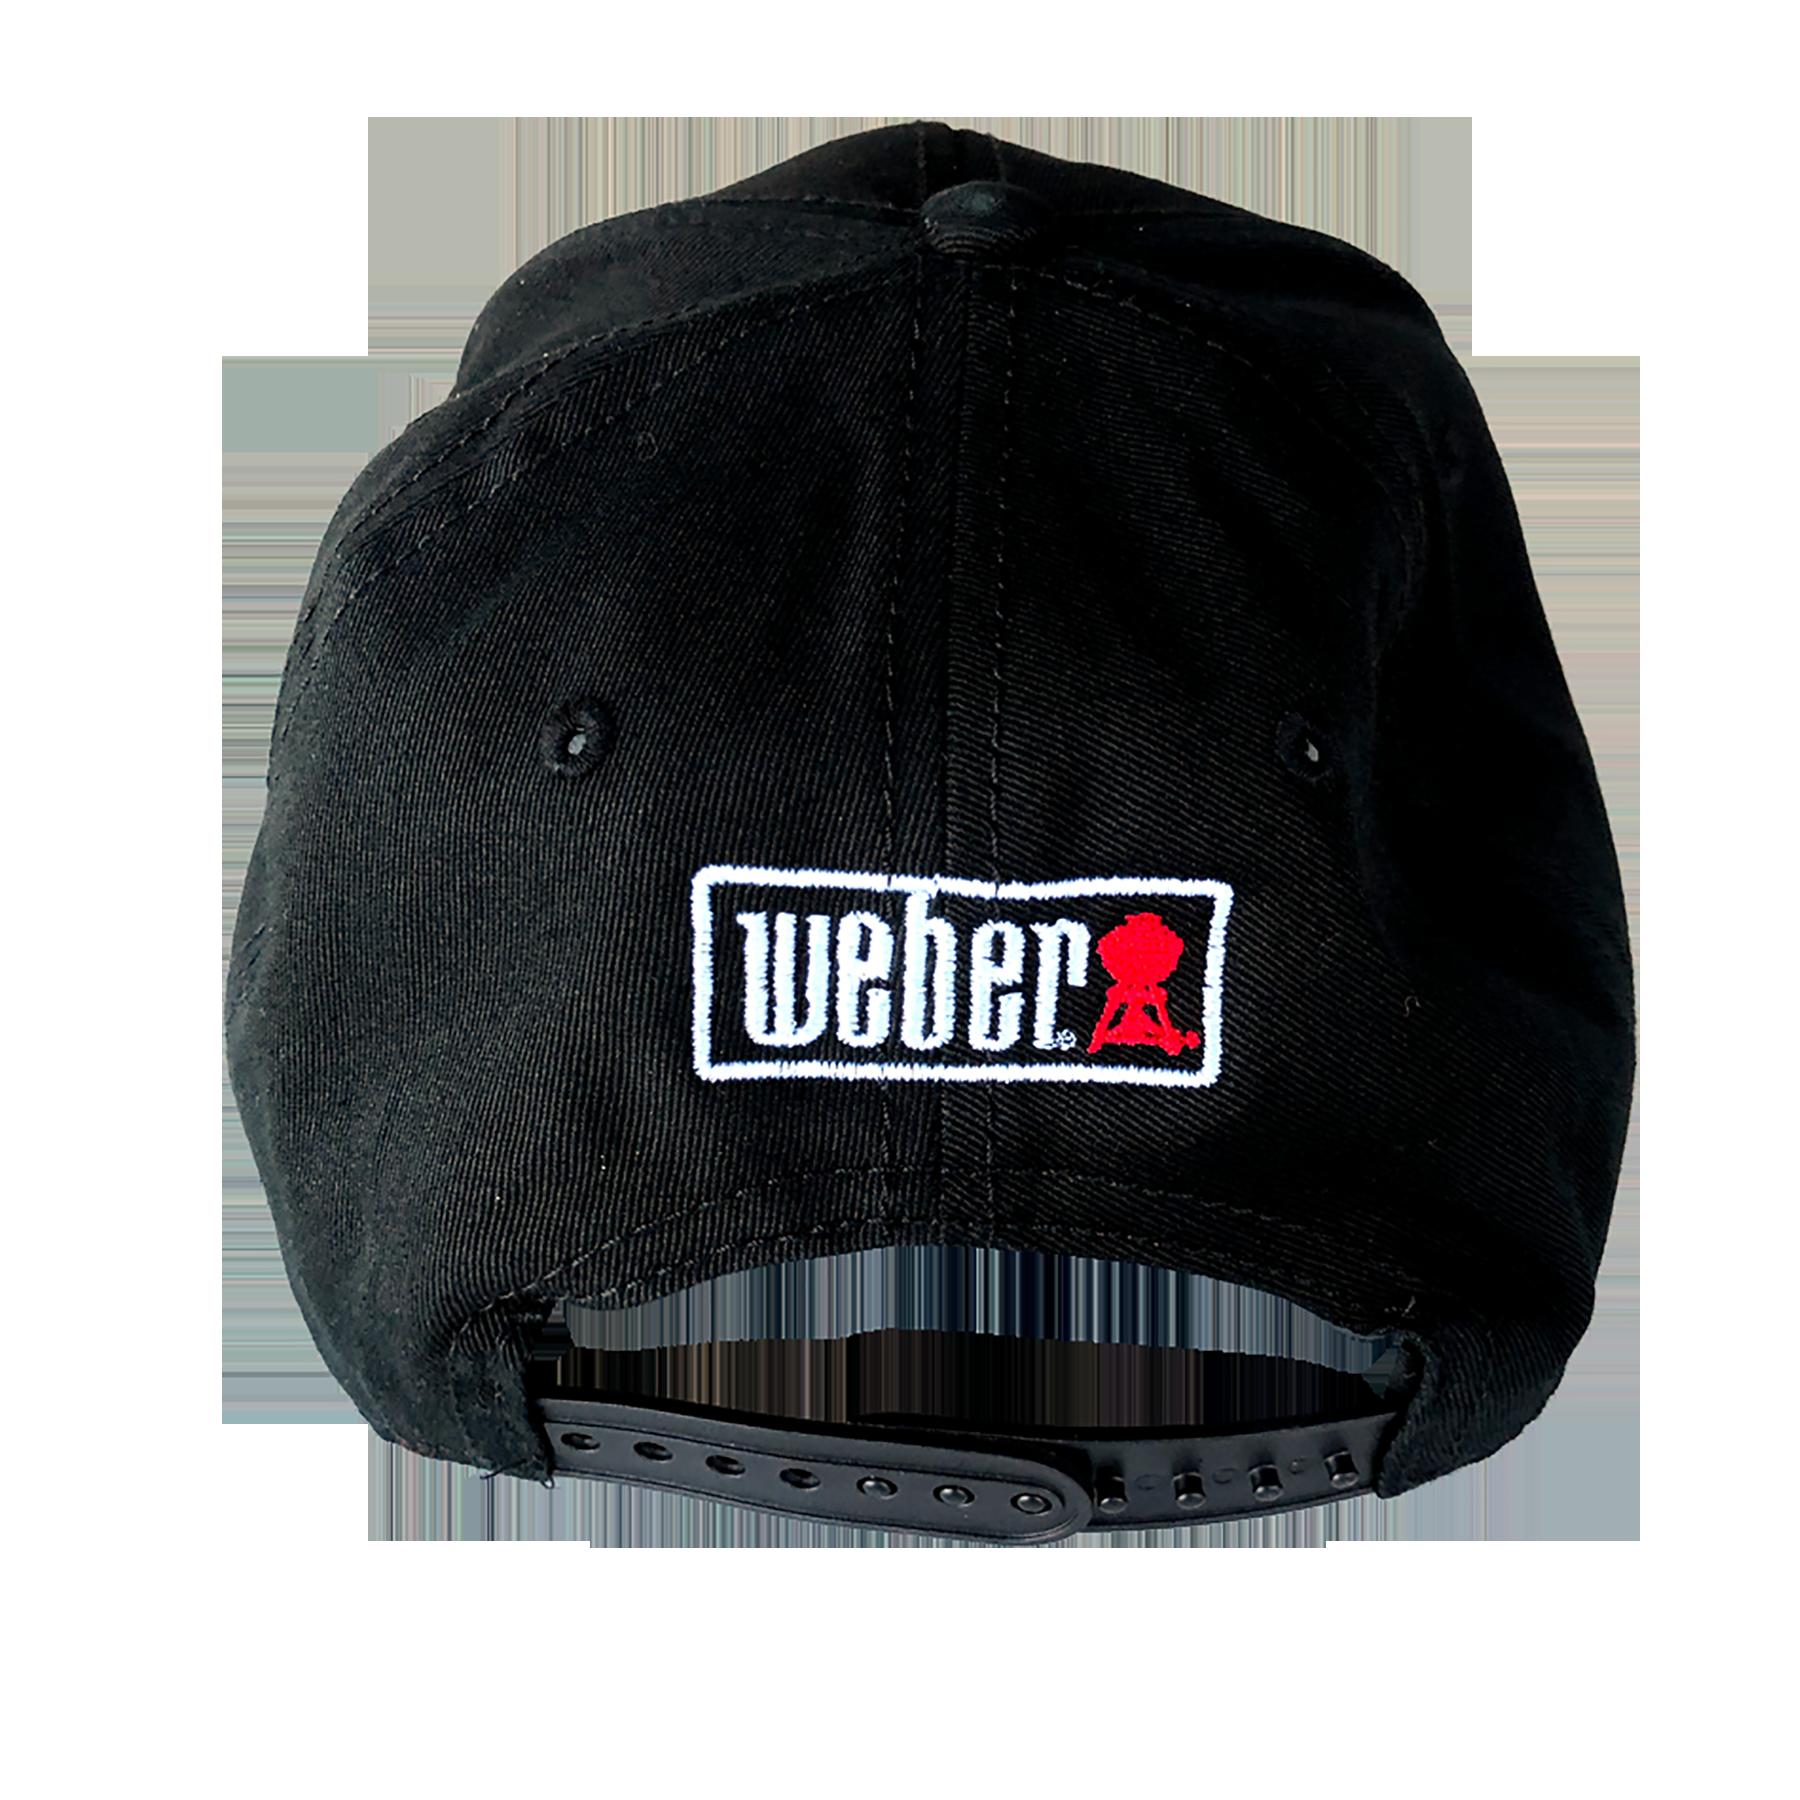 18028-baseball-cap-back_1800-x-18000